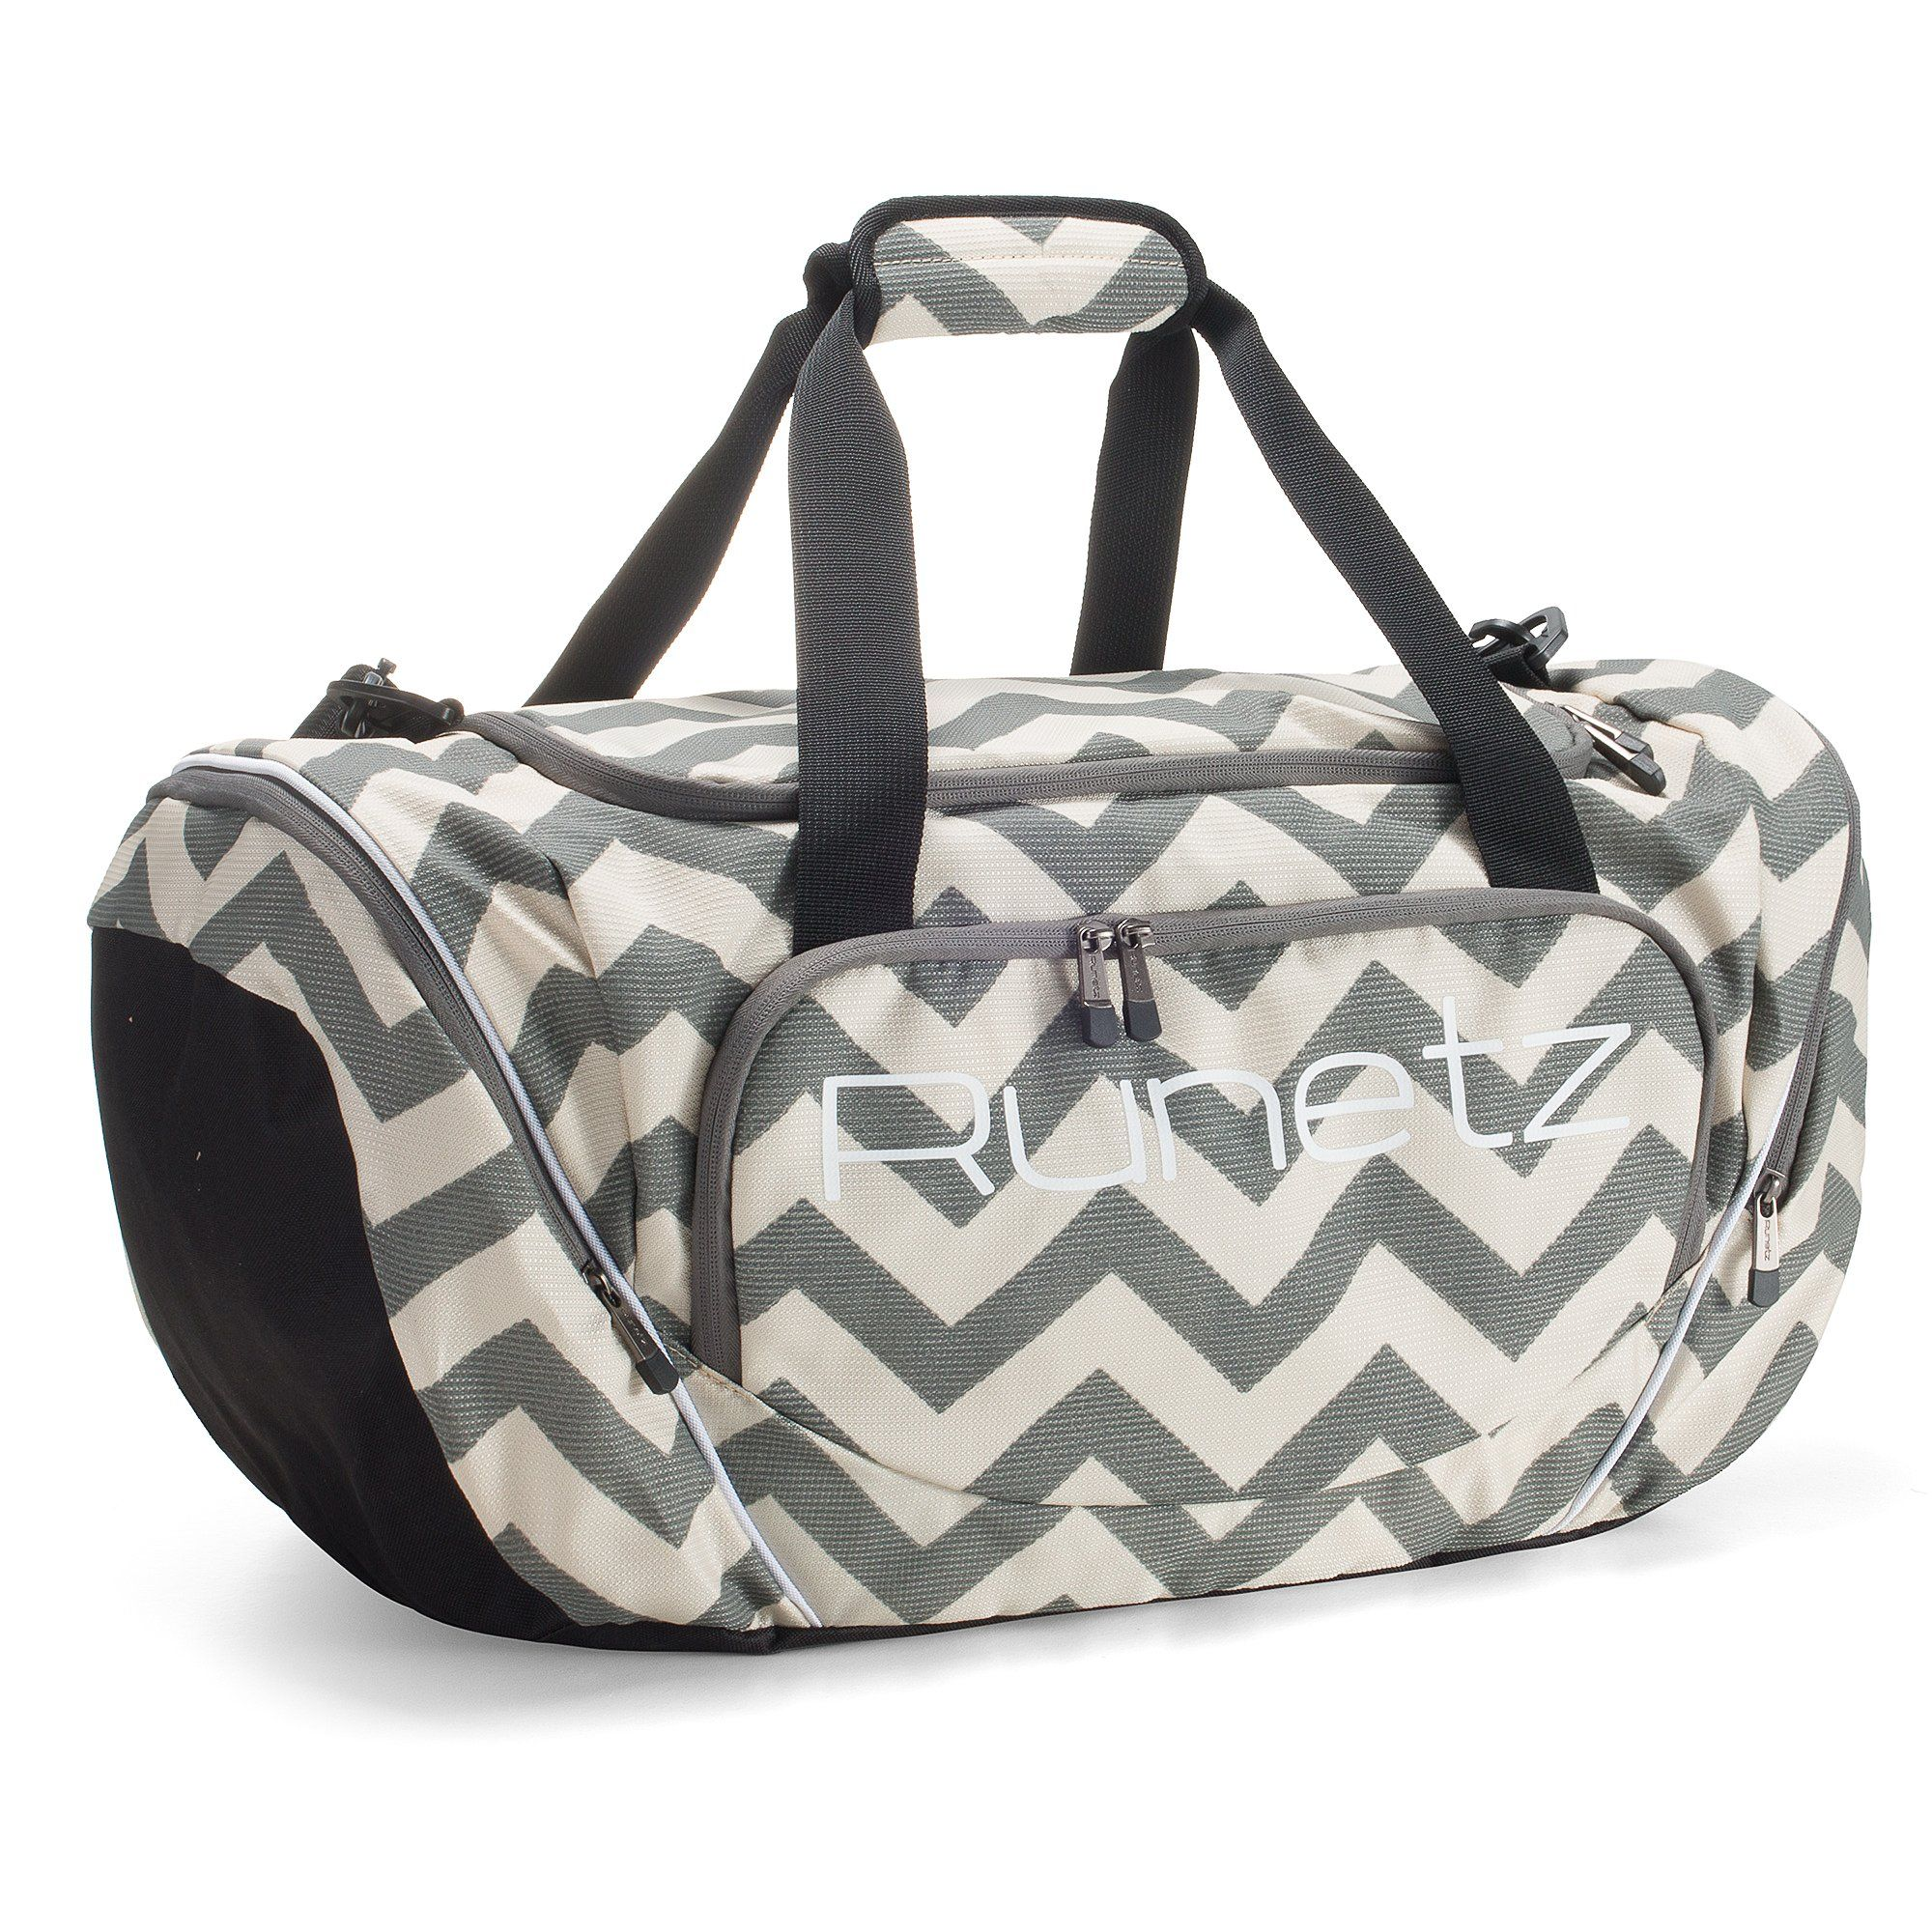 Amazon.com: Runetz - Chevron GRAY Gym Bag Athletic Sport Shoulder Bag for Men & Women Duffel 20-inch Large - Chevron Grey:… | Shoulder bag men, Bags, Womens gym bag